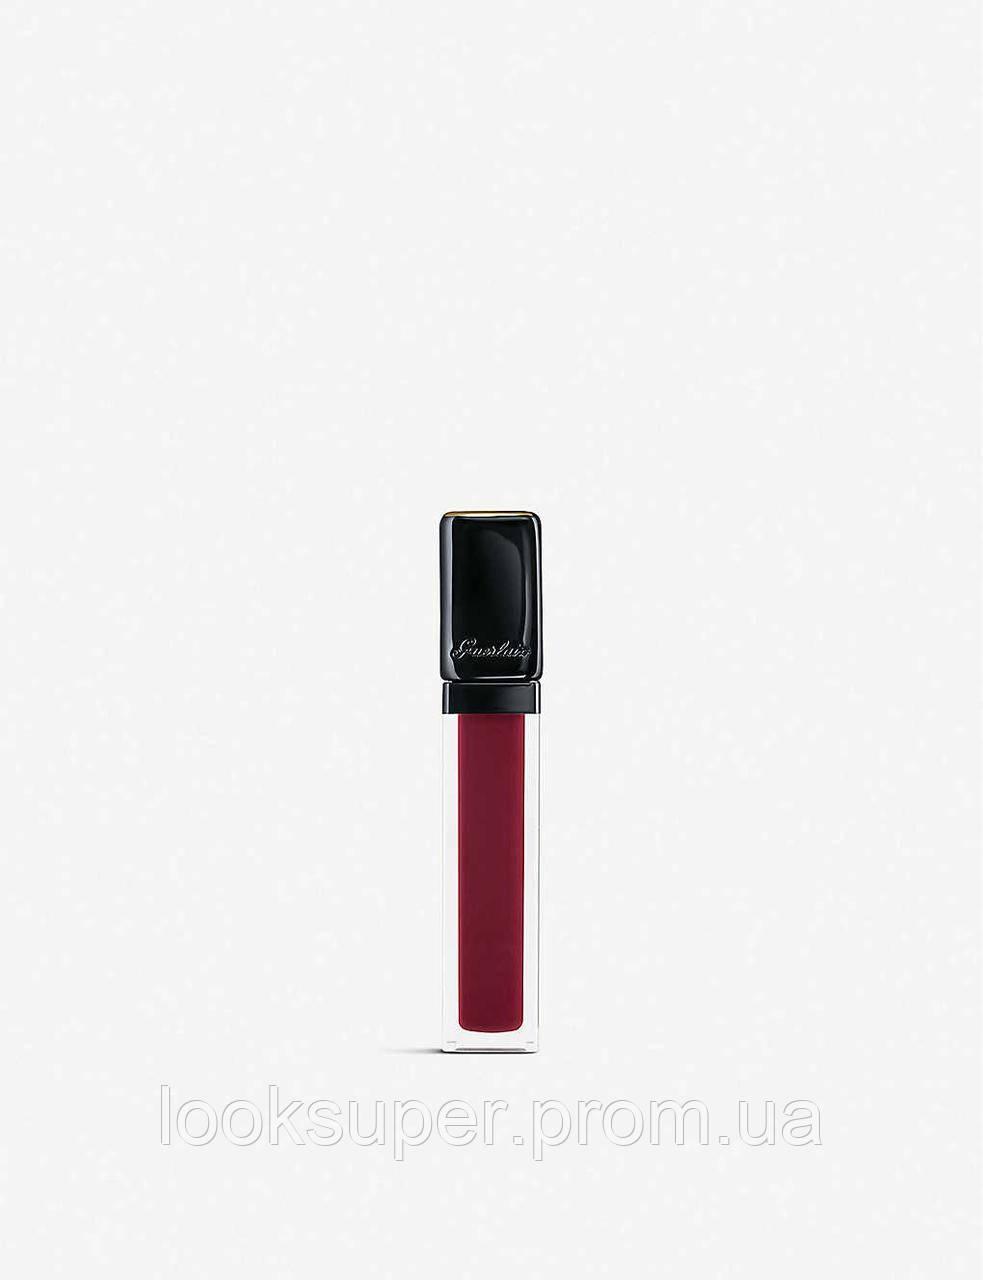 Матовый блеск для губ Guerlain KissKiss liquid matte (5.8ml)